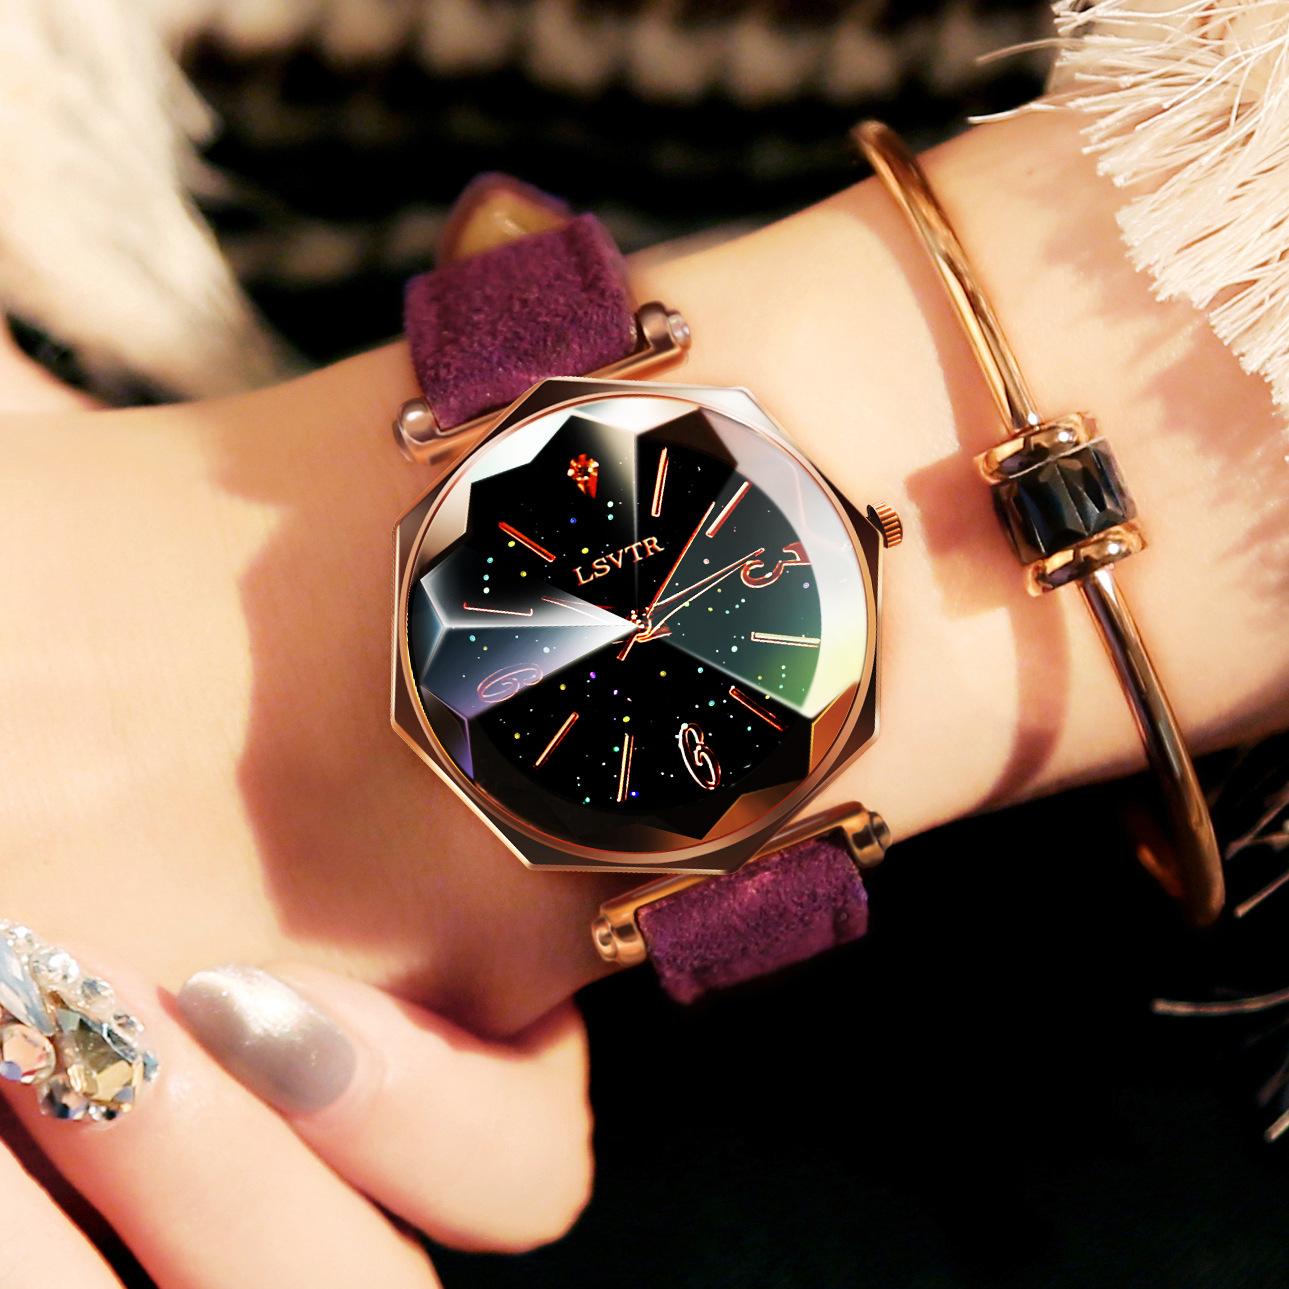 LSVTR厂家批发爆款女表时尚水钻休闲创意手表网红皮带石英表礼品